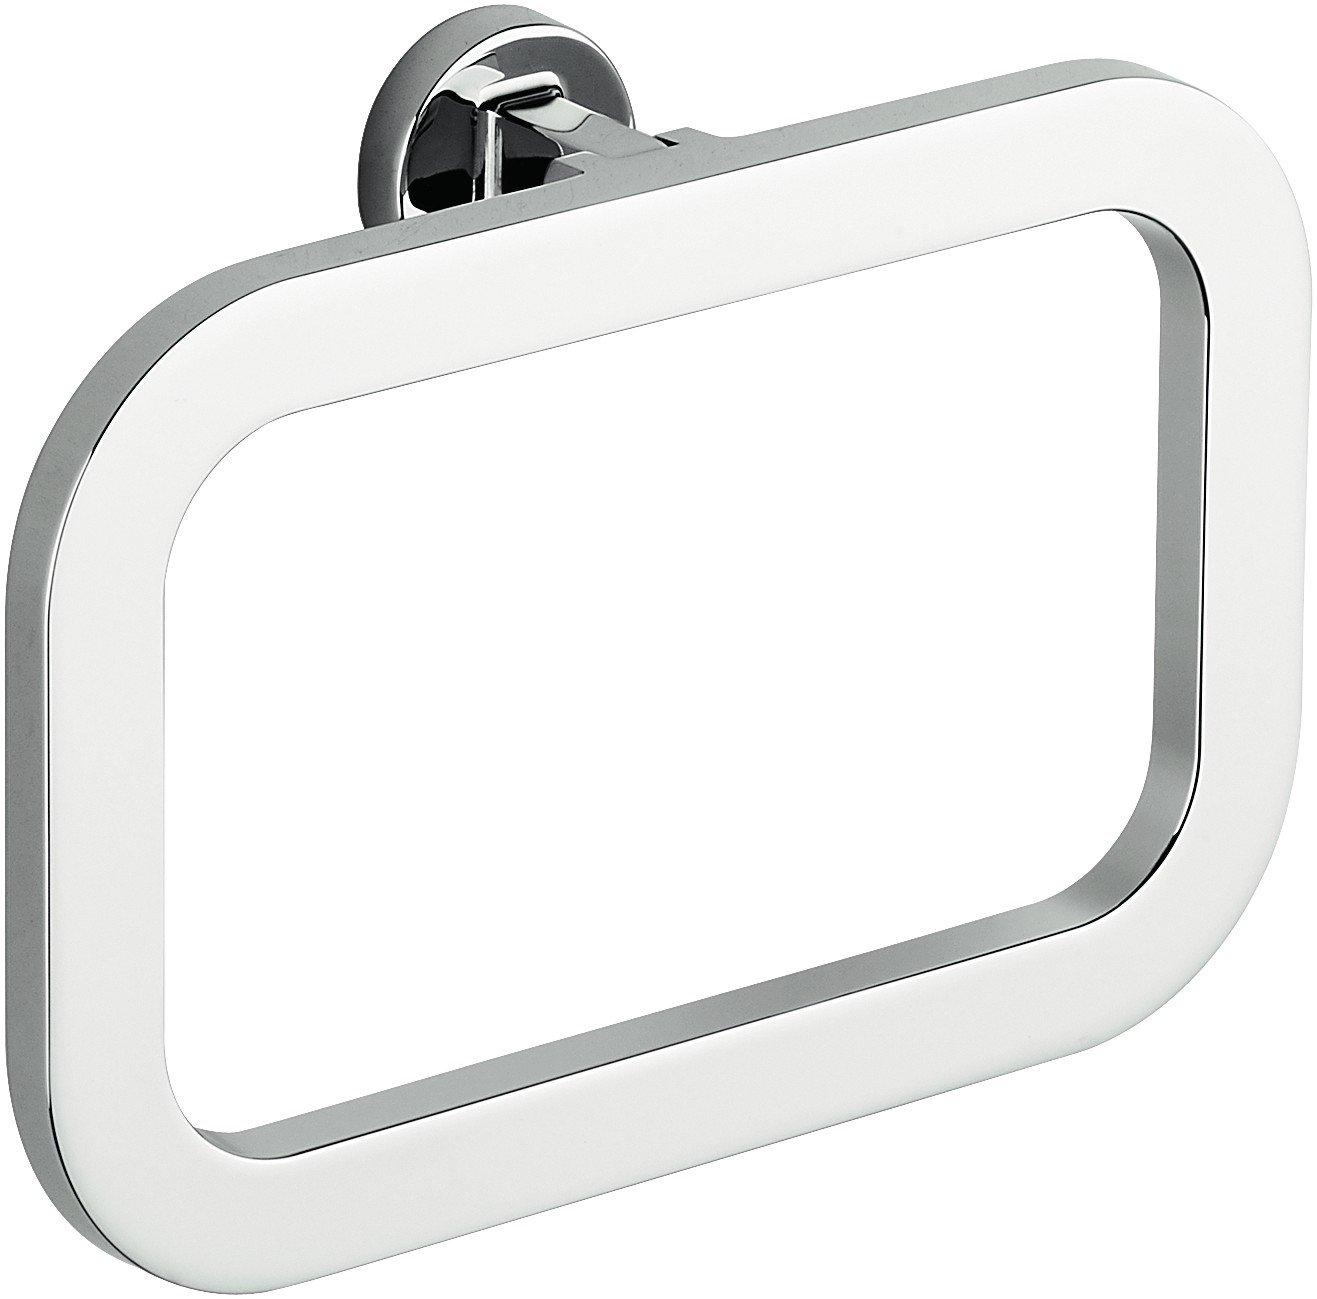 Colombo dise/ño beb17cr Puerta Ropa Serie Nordic